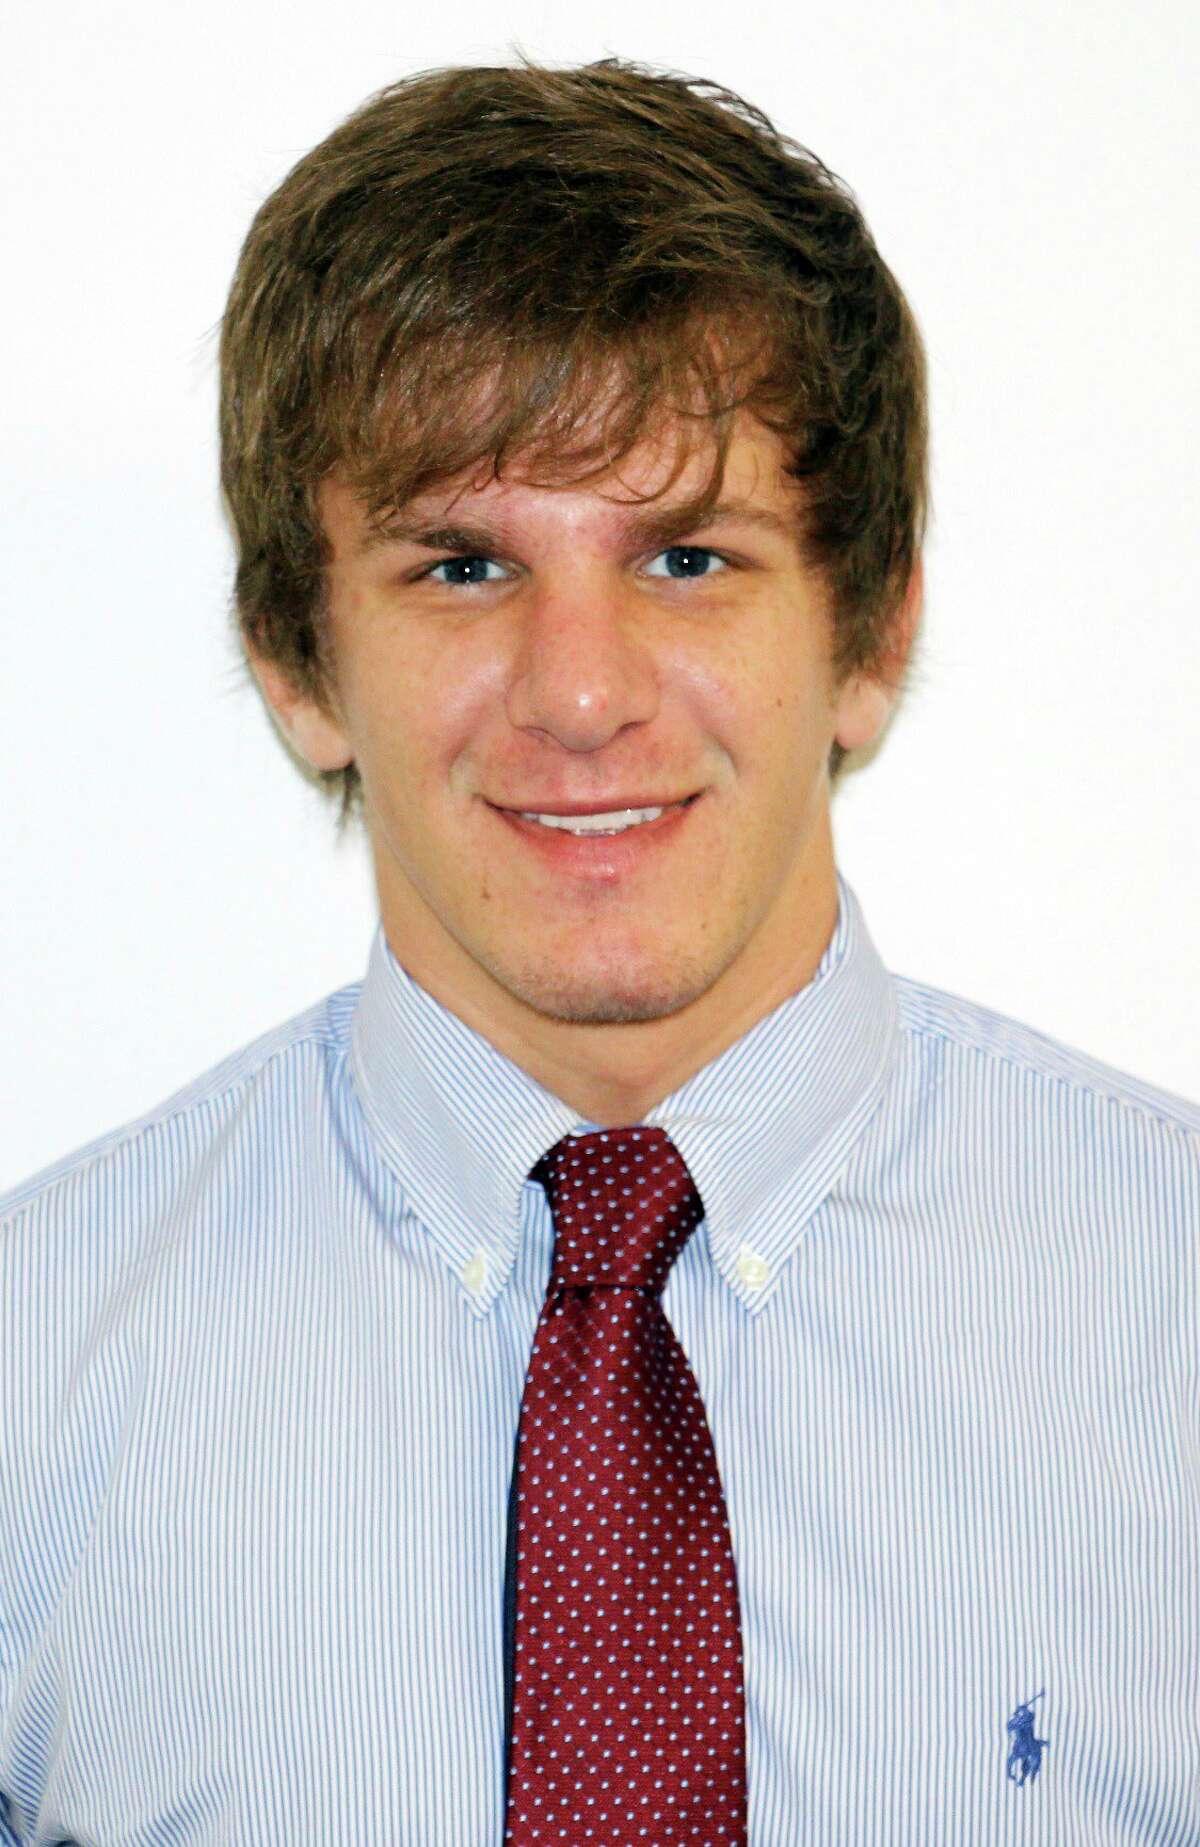 Bradley Massman